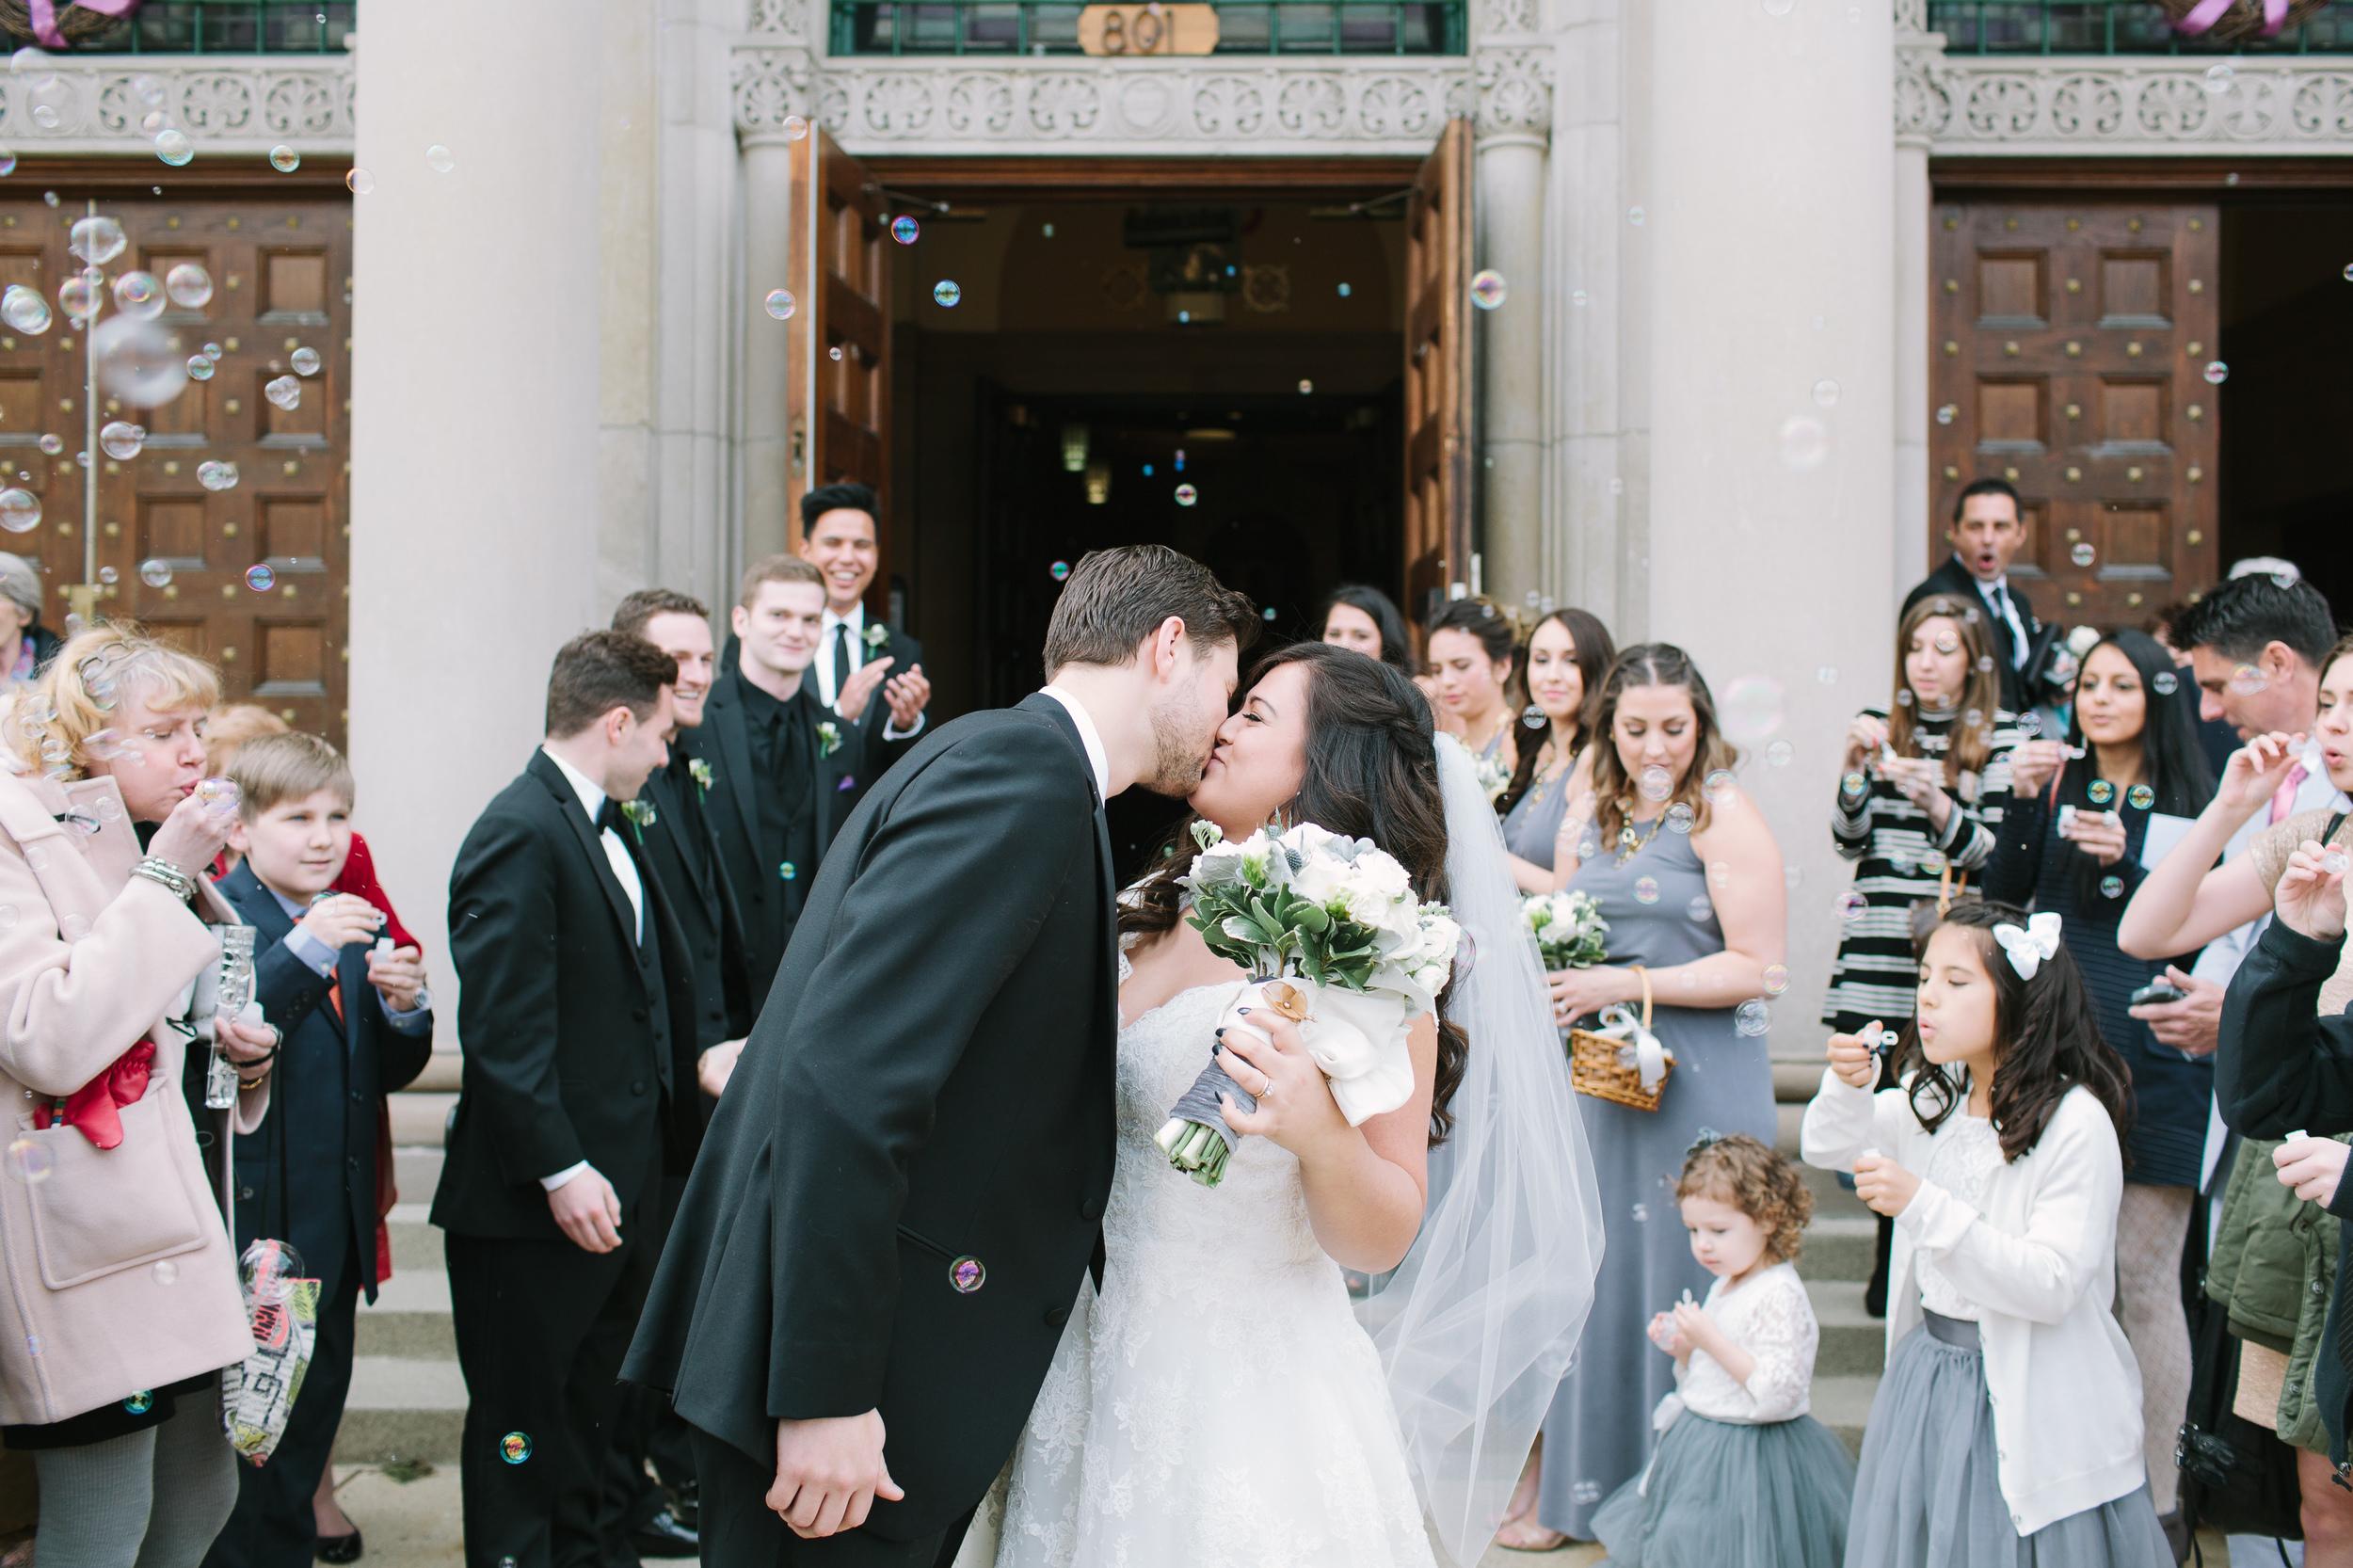 Nicodem Creative_Kerr Wedding_Bridgeport Art Center Chicago-10.jpg